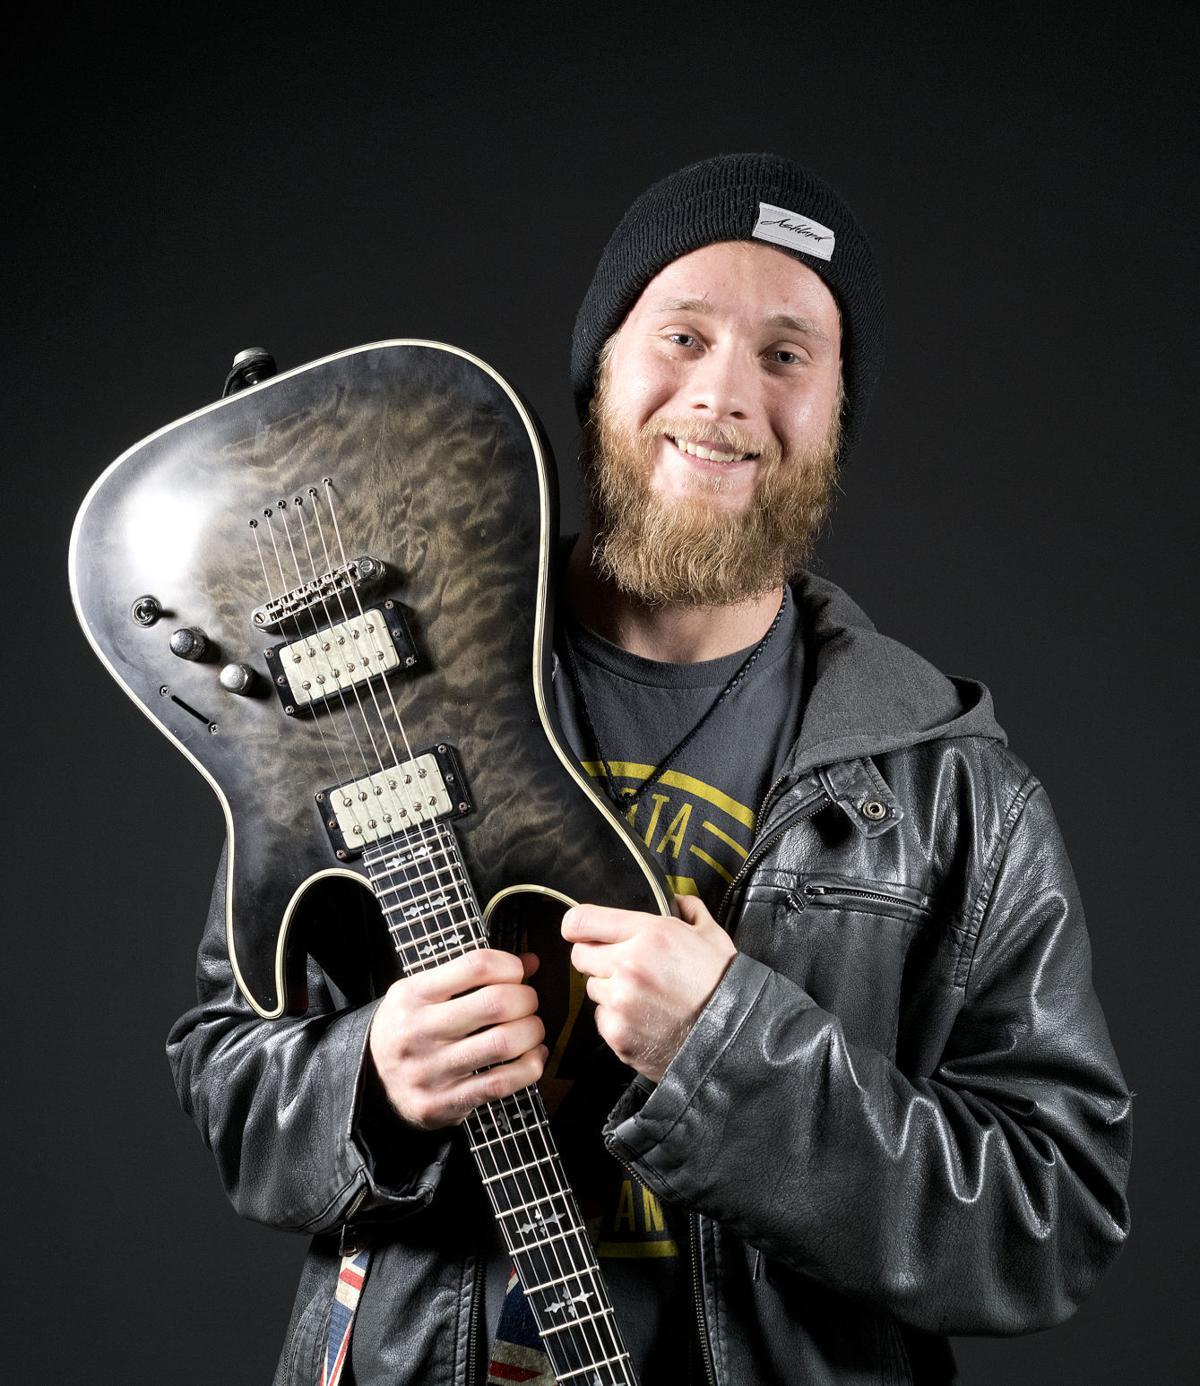 Musician Mike Kessel